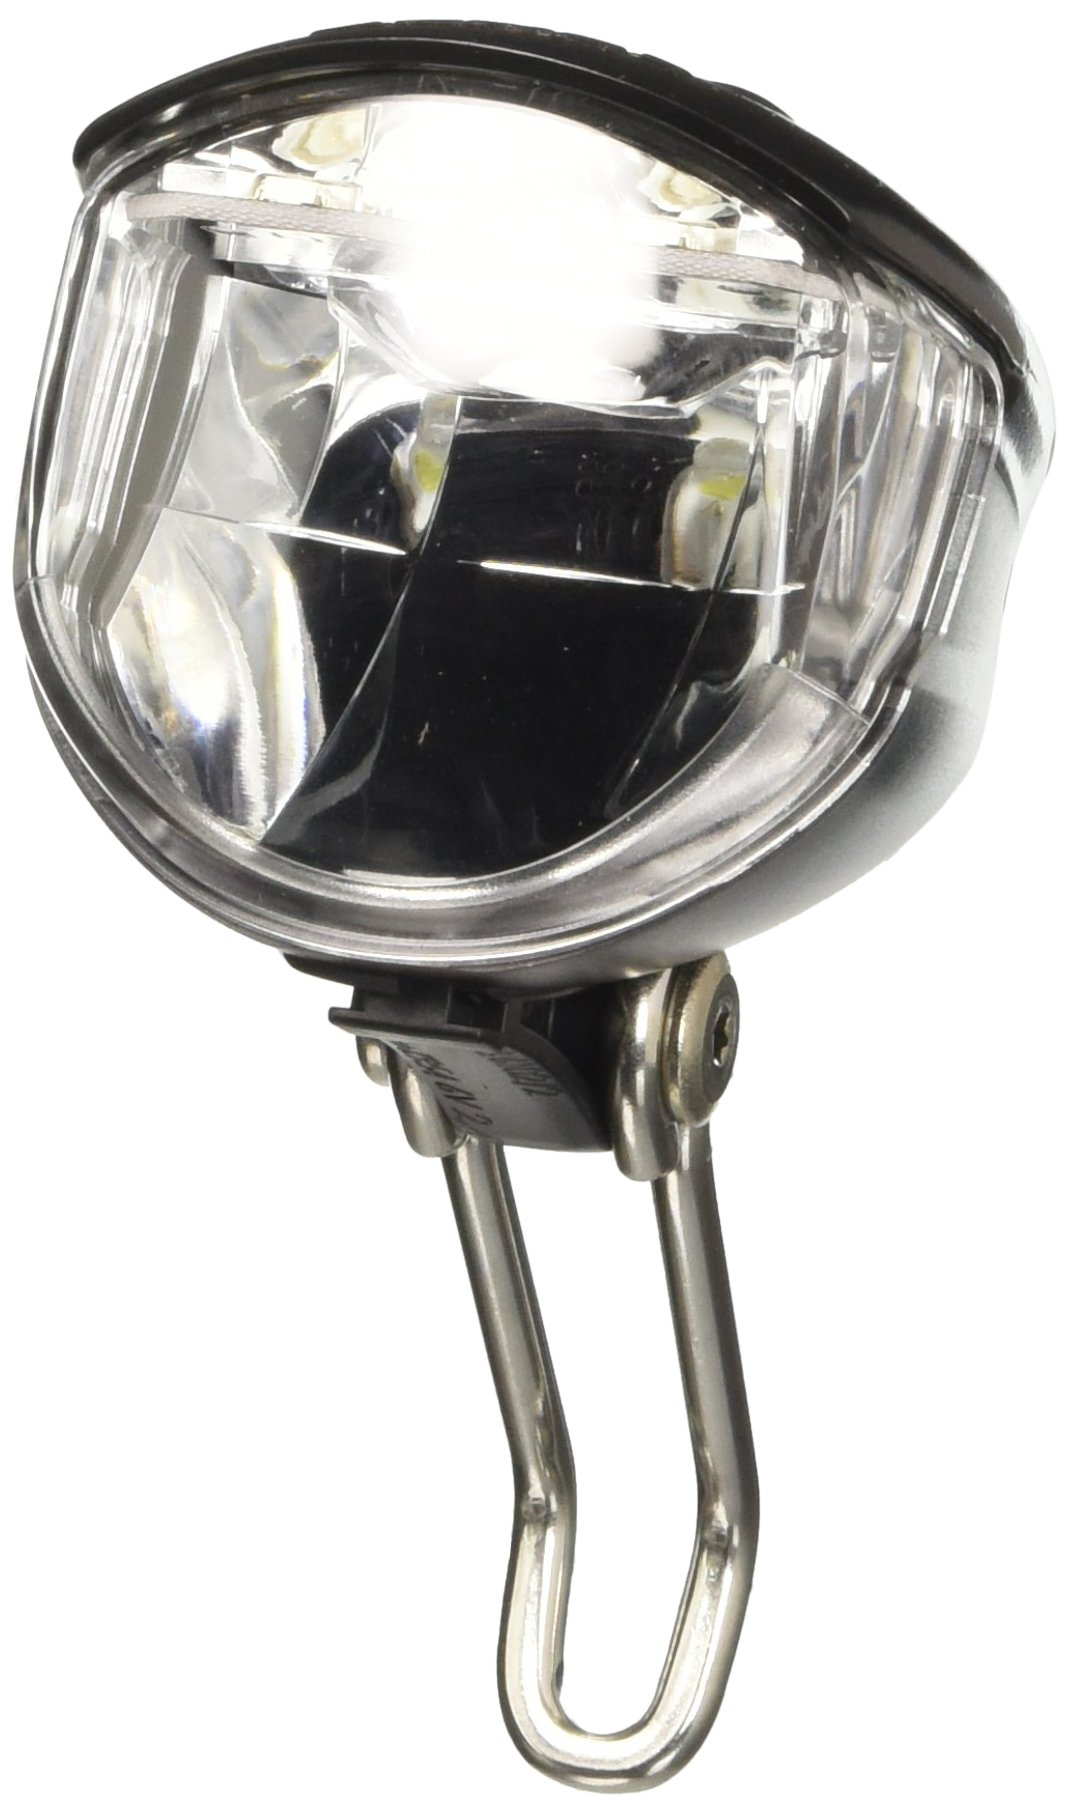 Busch u. Müller Lumotec IQ2 Luxos B dynamo bike lights black